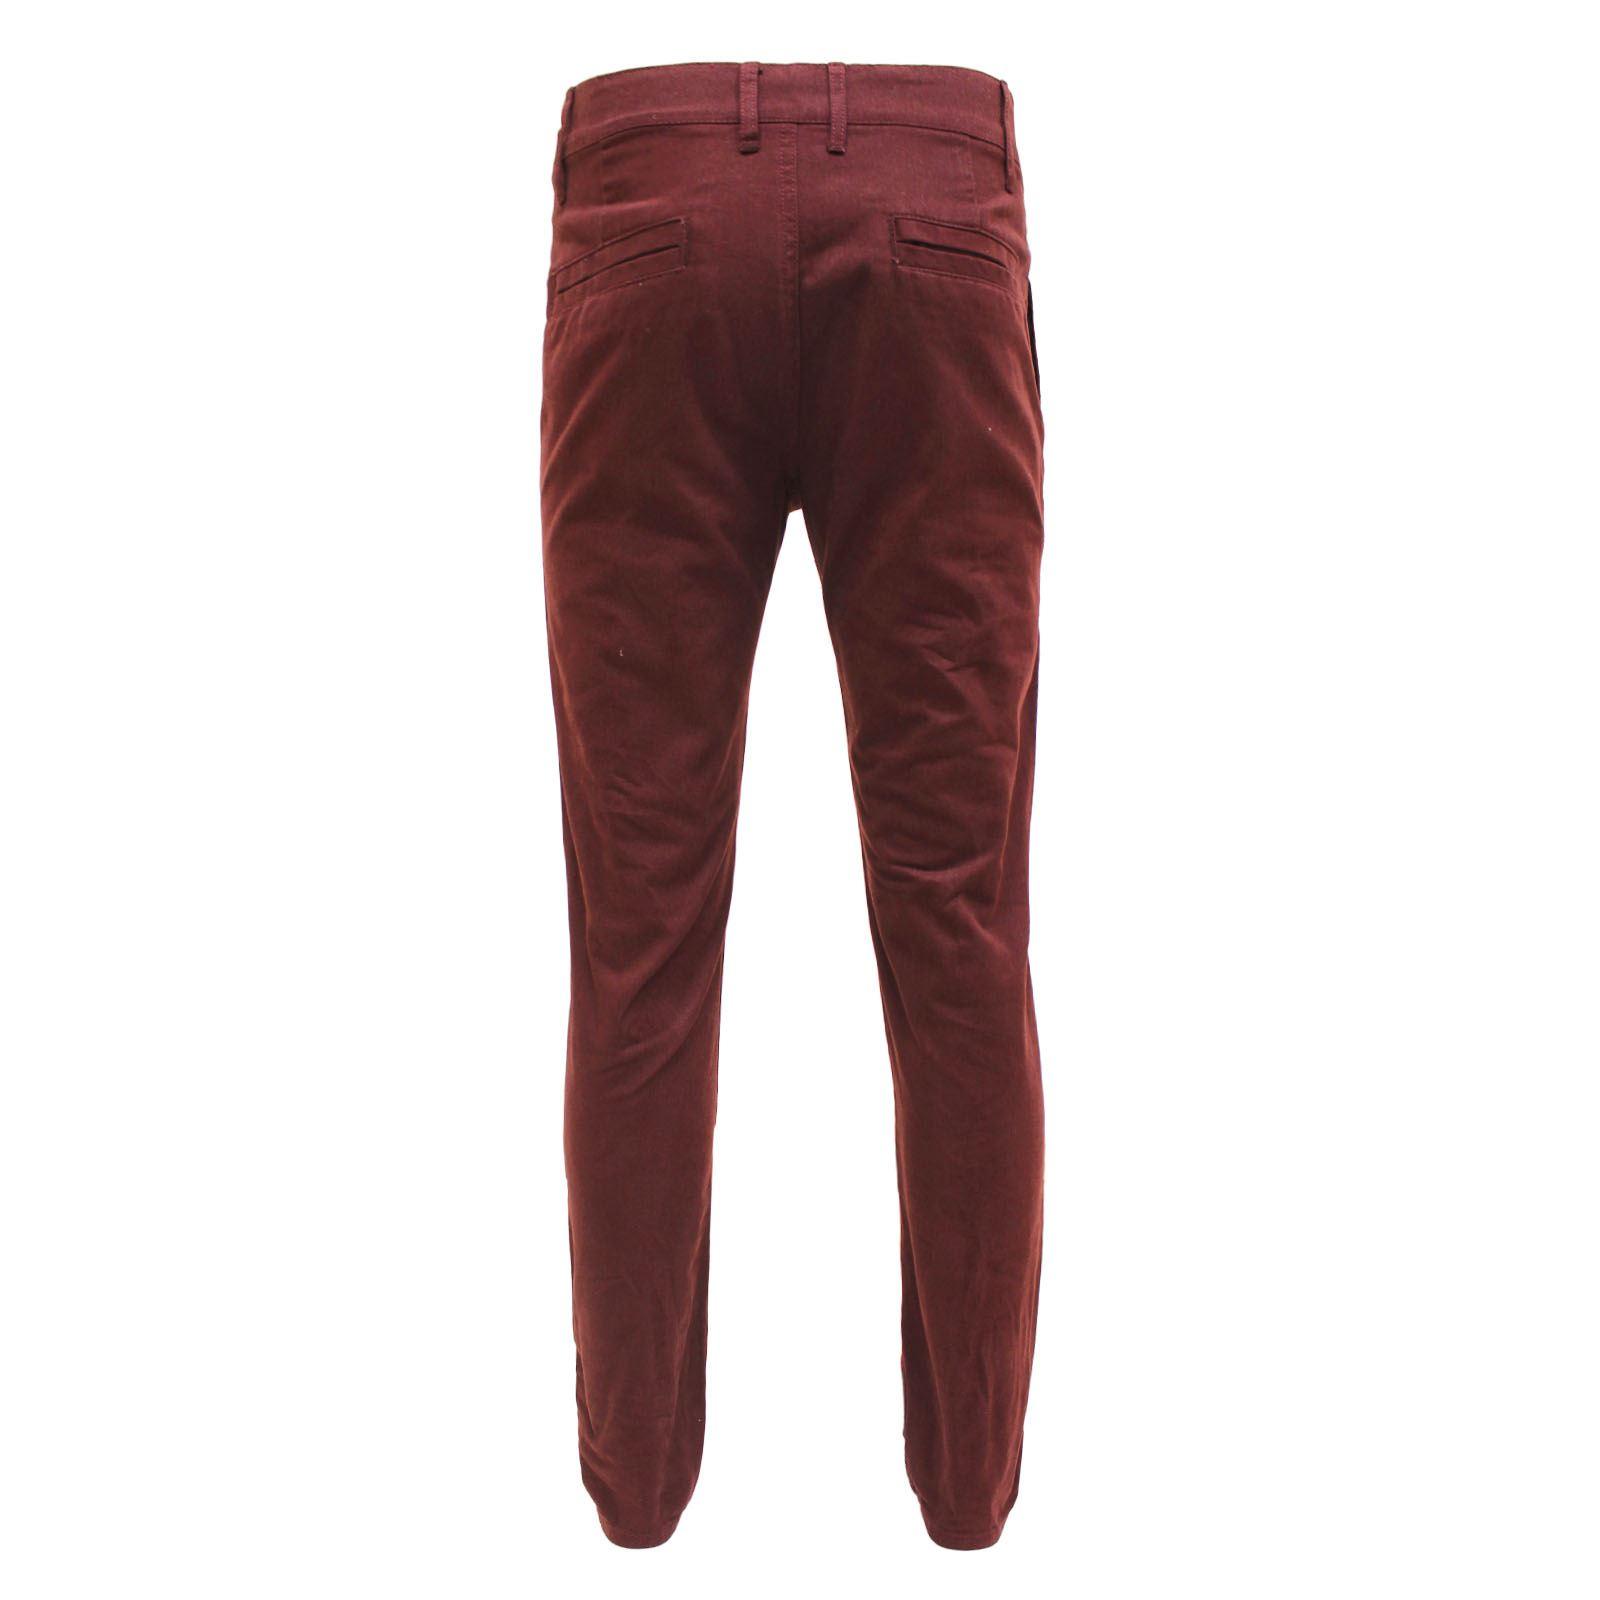 4092b32829 New Mens D-Struct Designer Regular Straight Leg Skinny Fit Chinos Jeans  Trousers